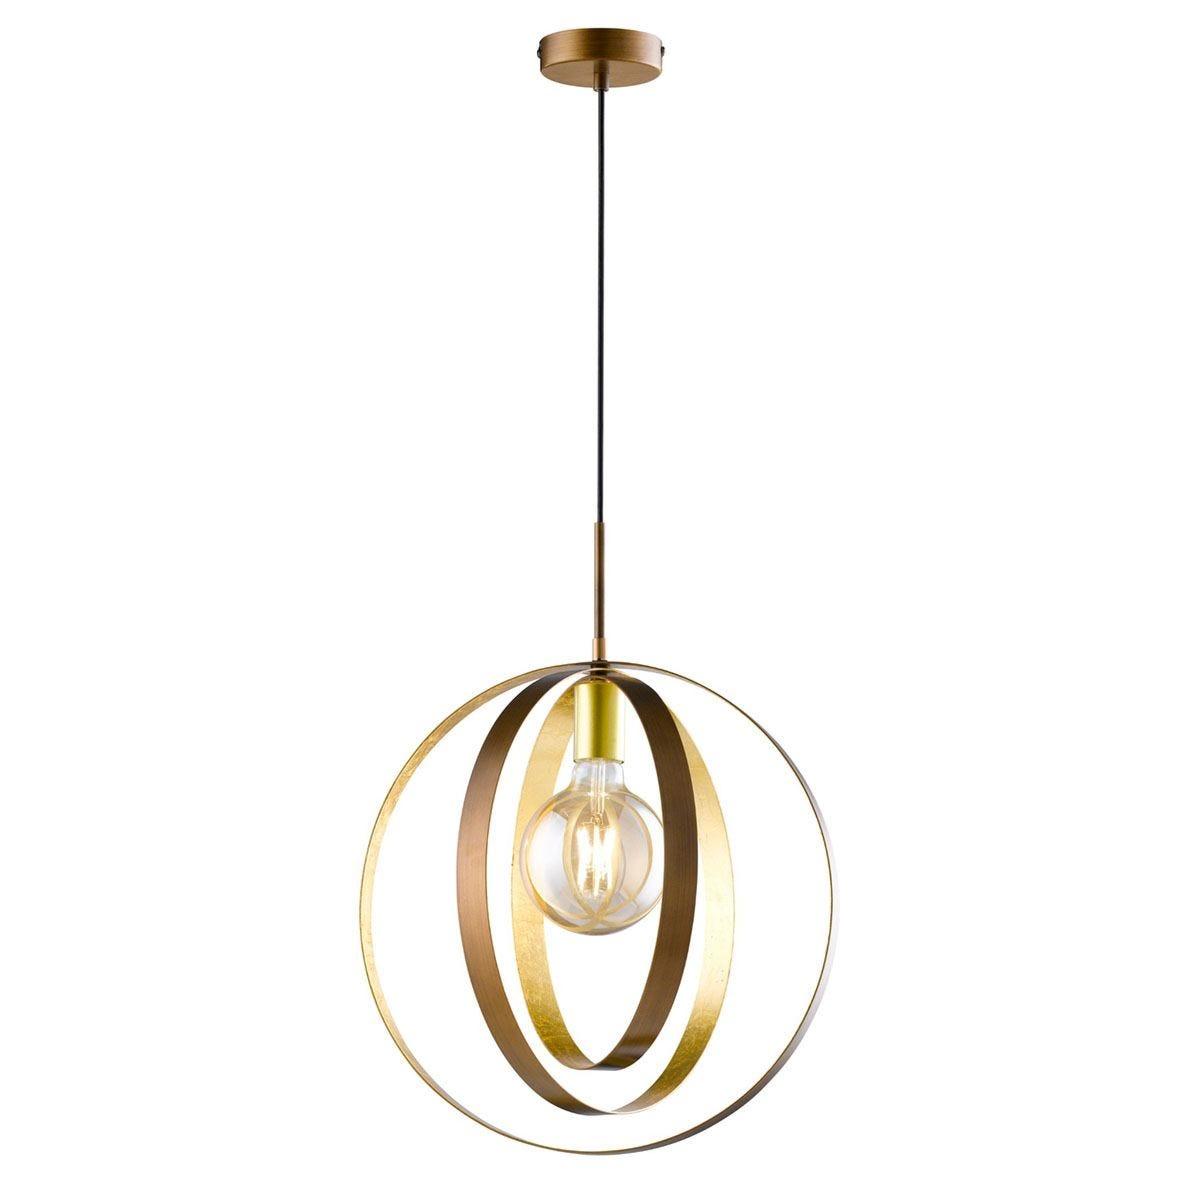 Wofi Cordoba Pendant Ceiling Light - Brown